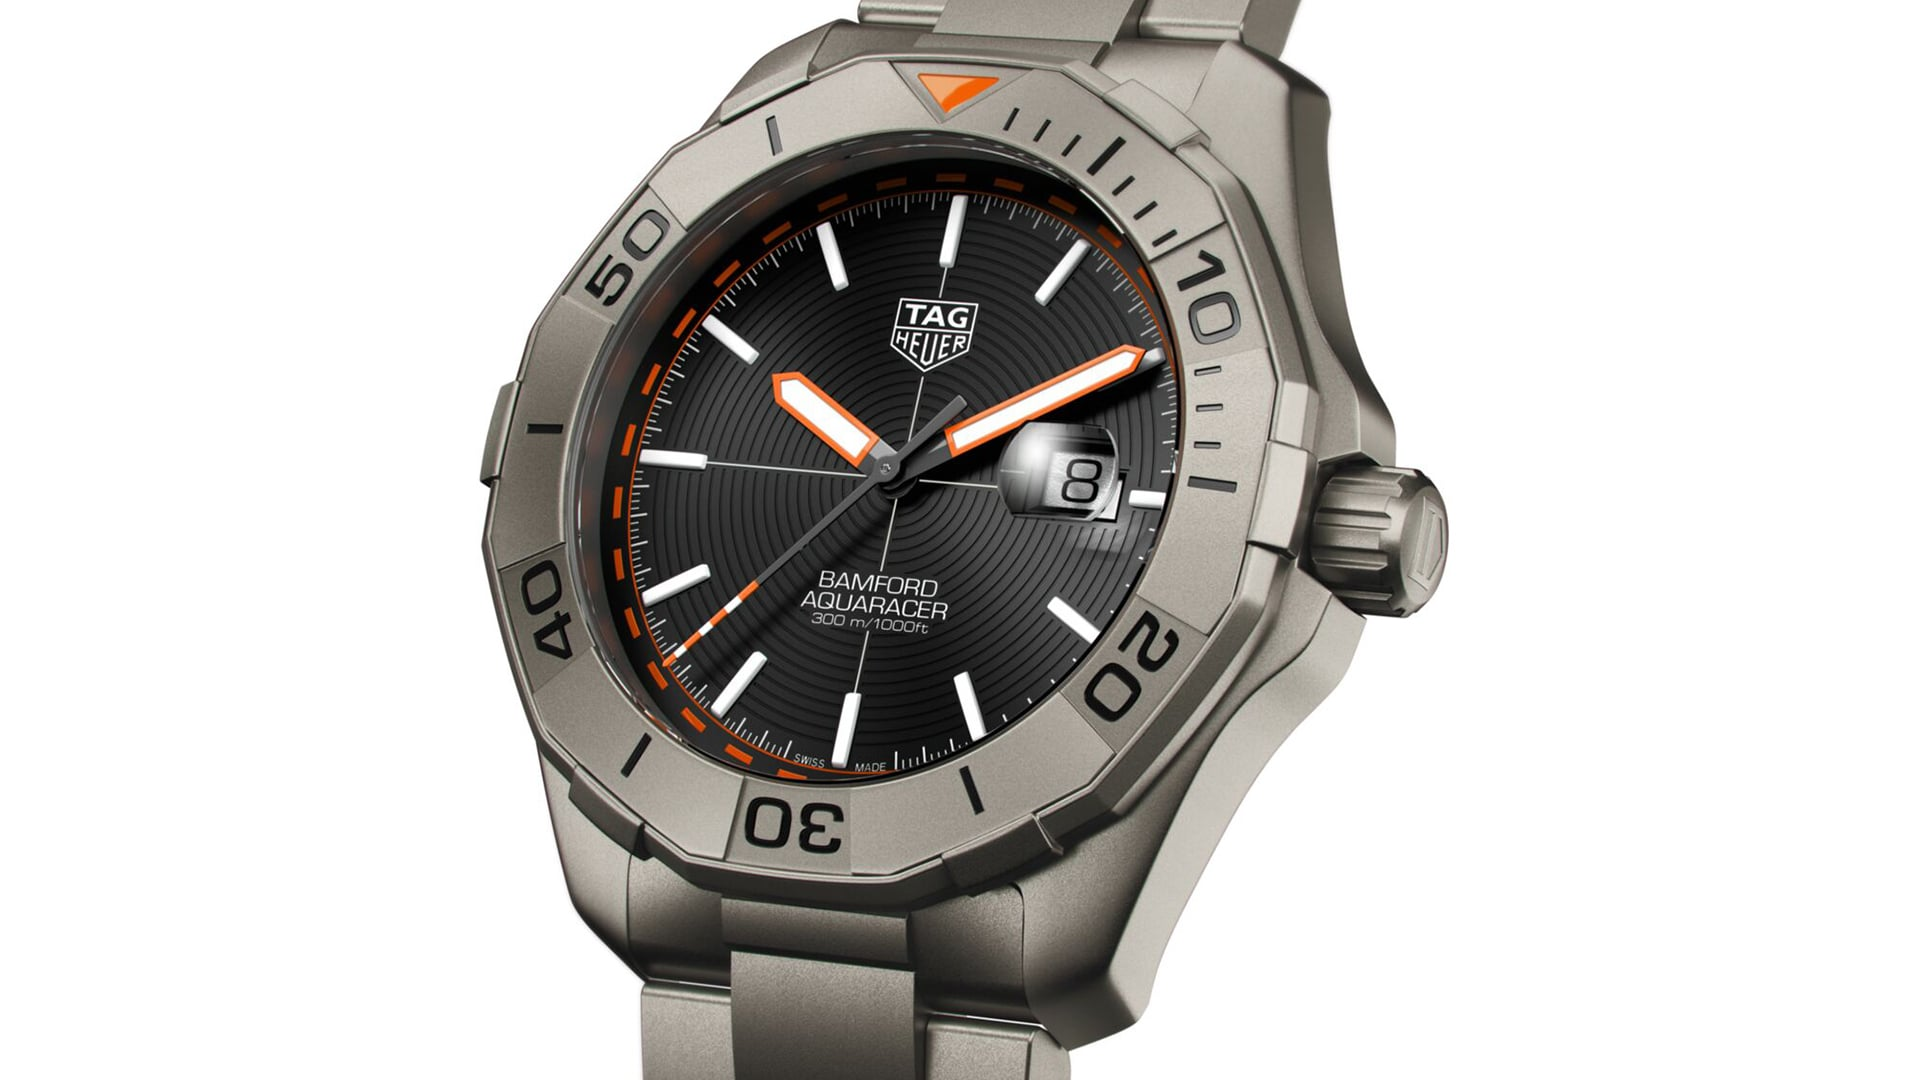 TAG Heuer Aquaracer Bamford Limited Edition 1 min